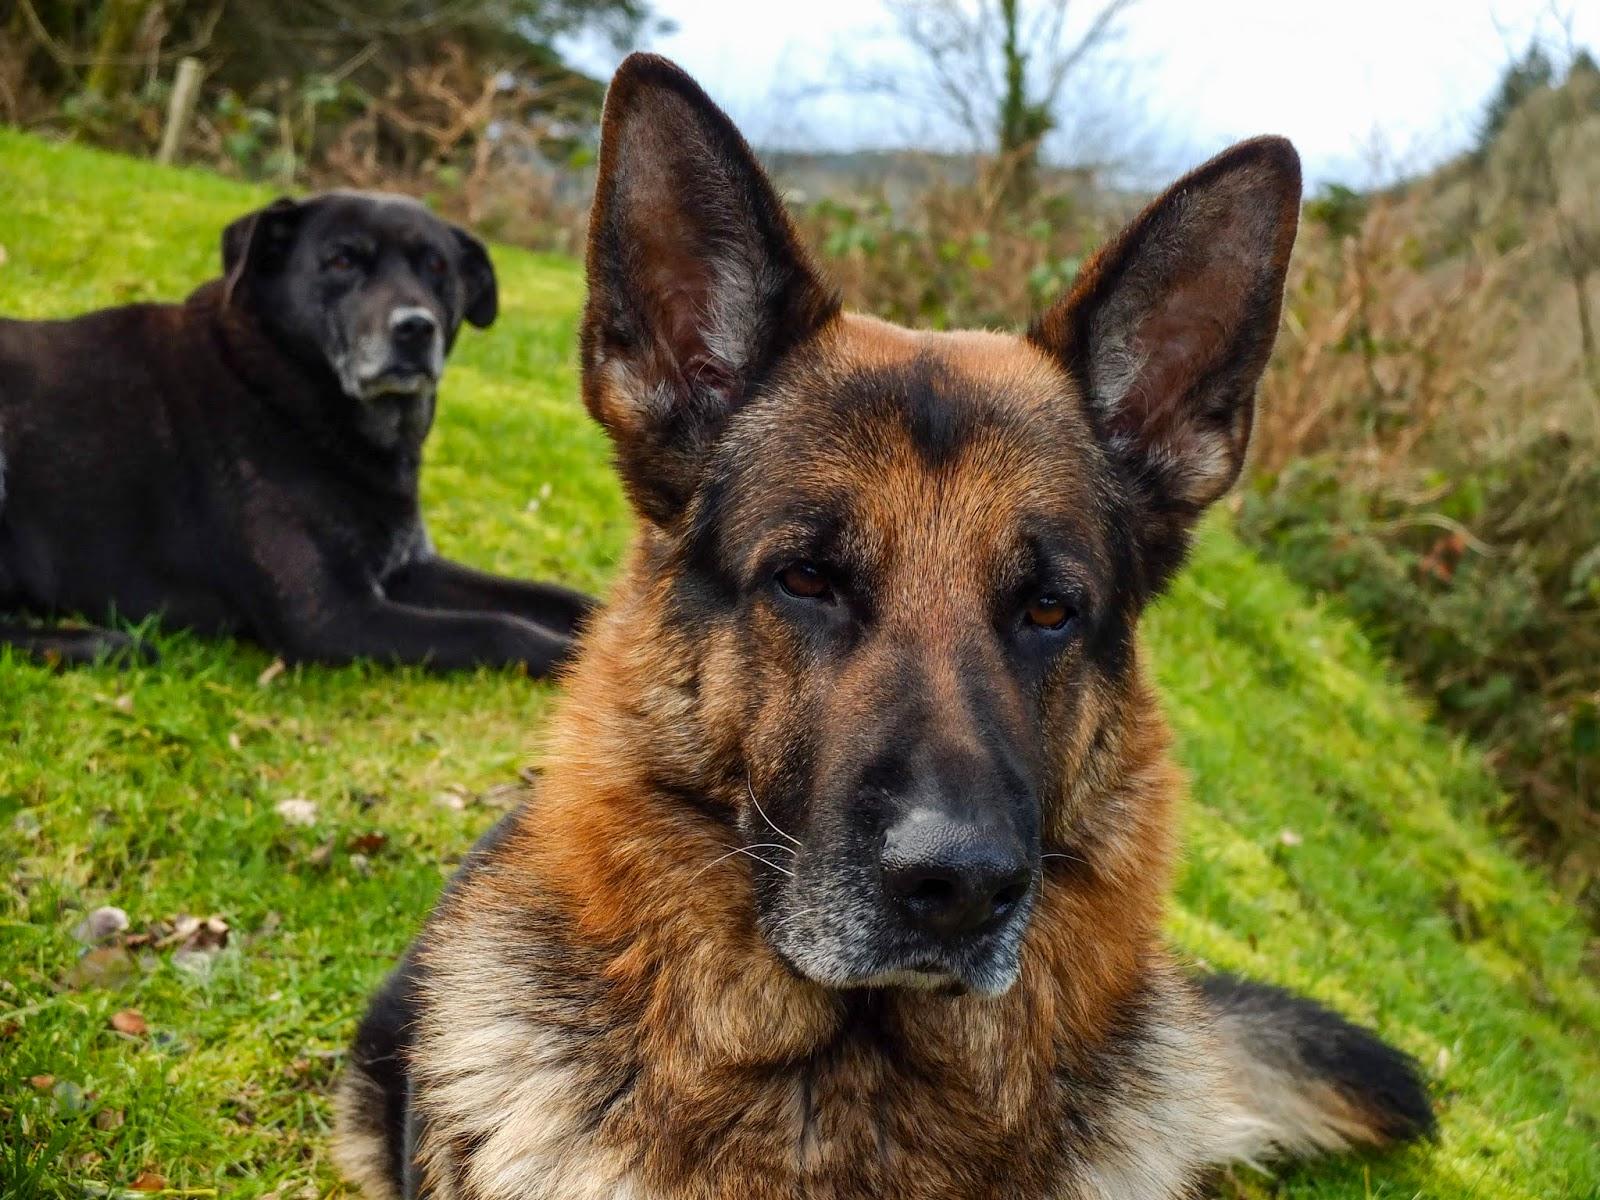 German Shepherd Steve with a black Labrador Judy lying down behind him.